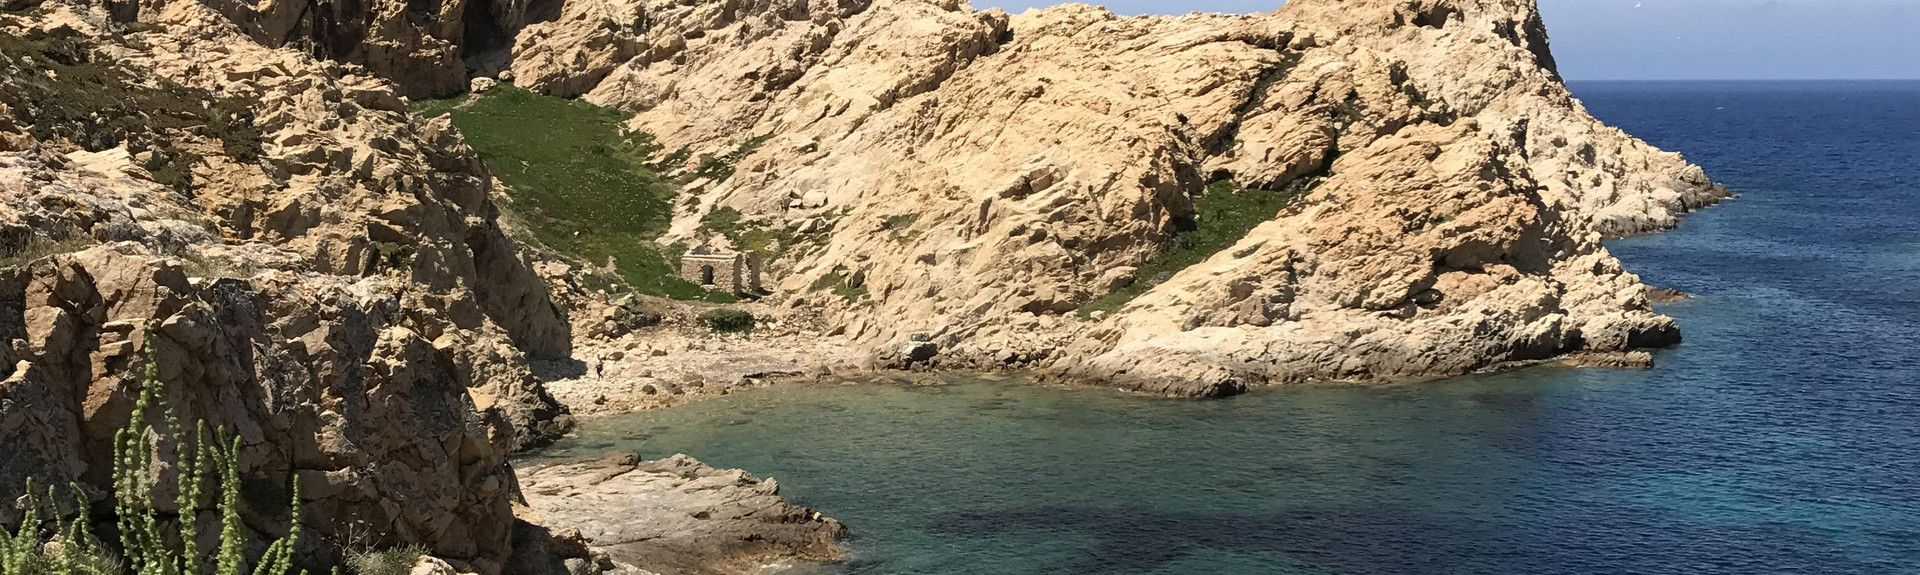 Urtaca, Haute-Corse, France